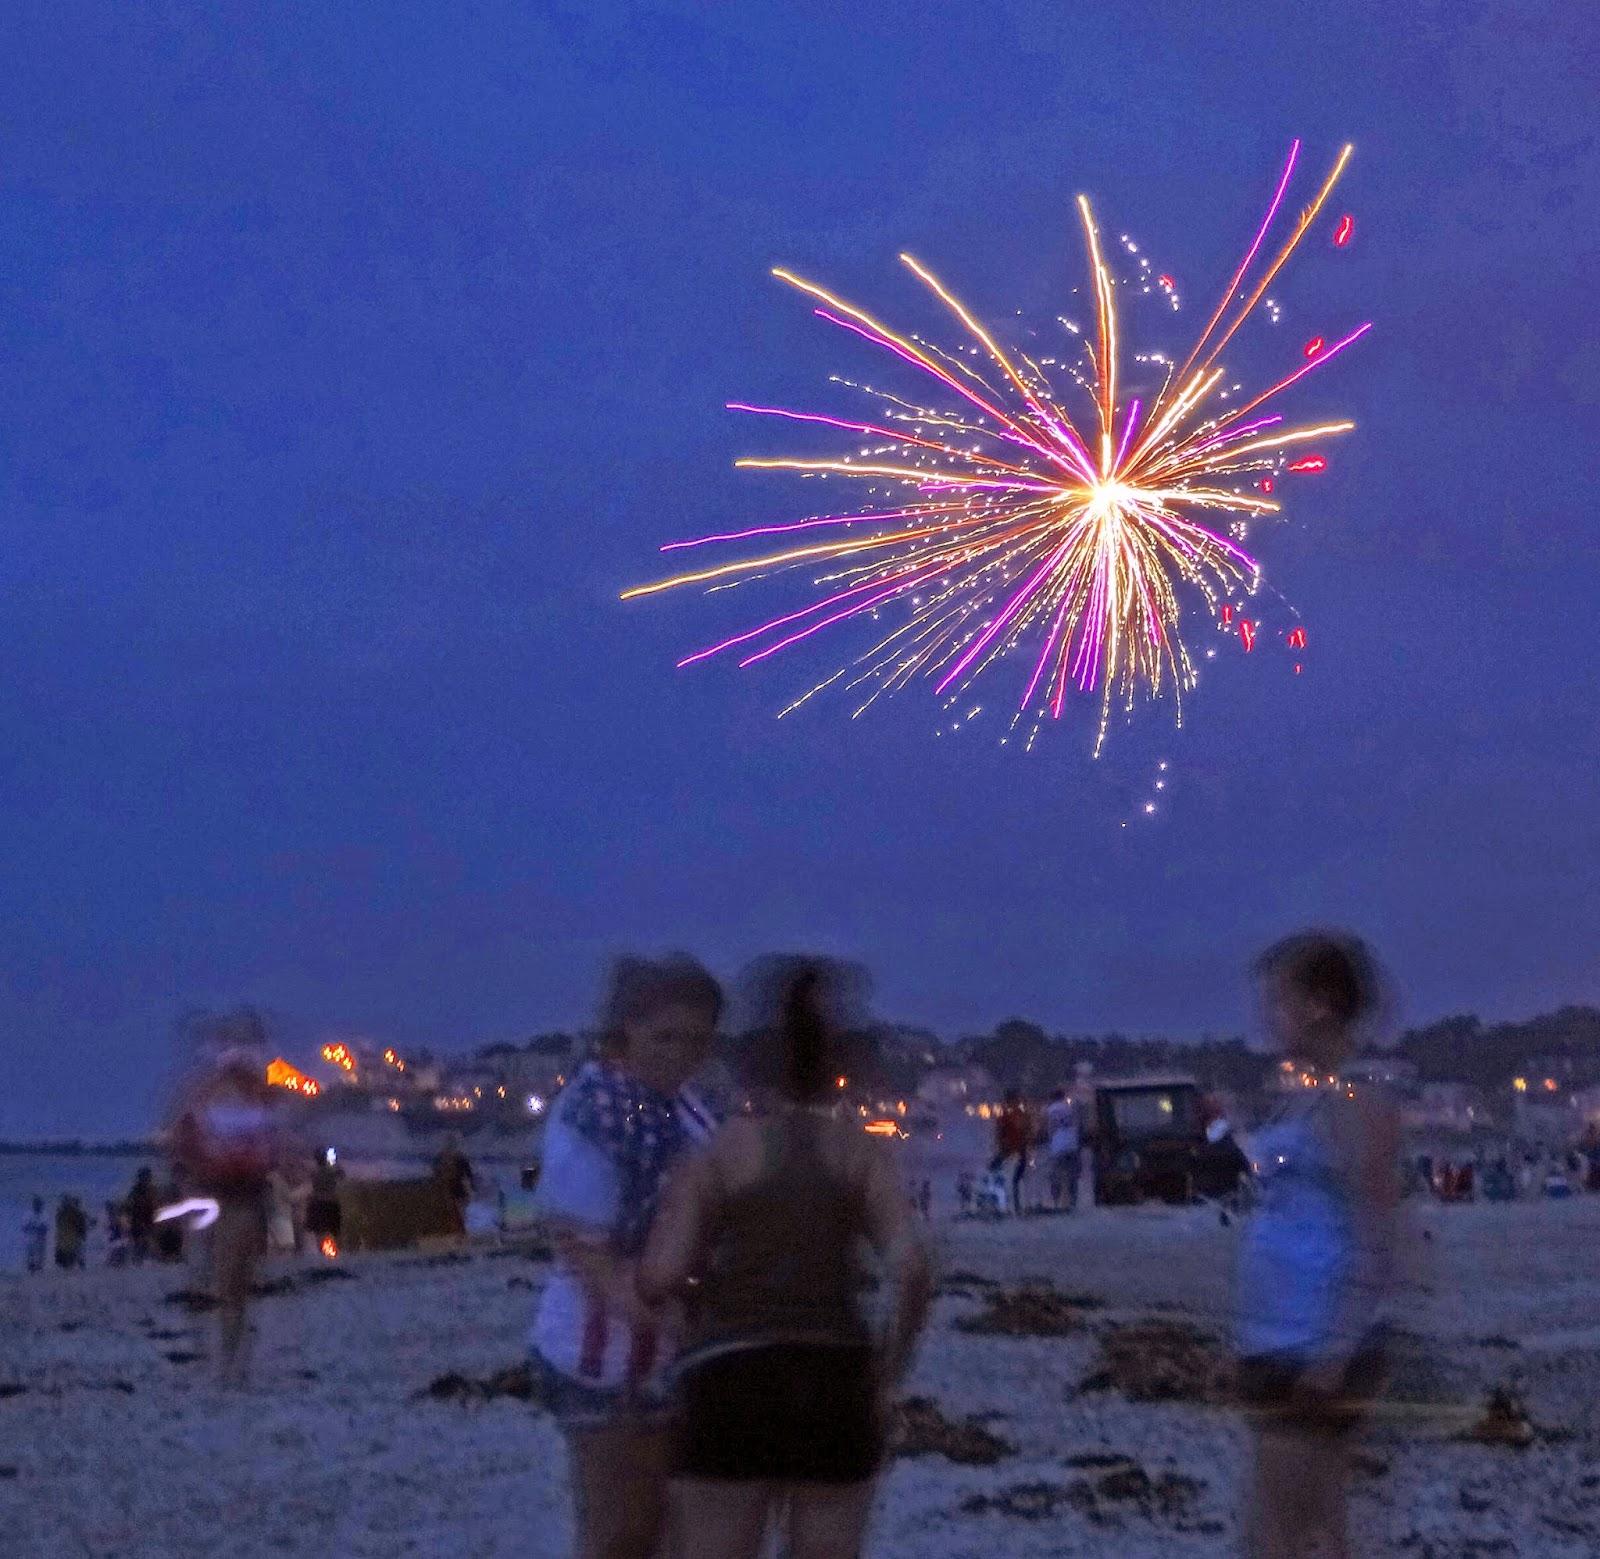 Joe's Retirement Blog: Fireworks and Bonfires, White Horse Beach ...